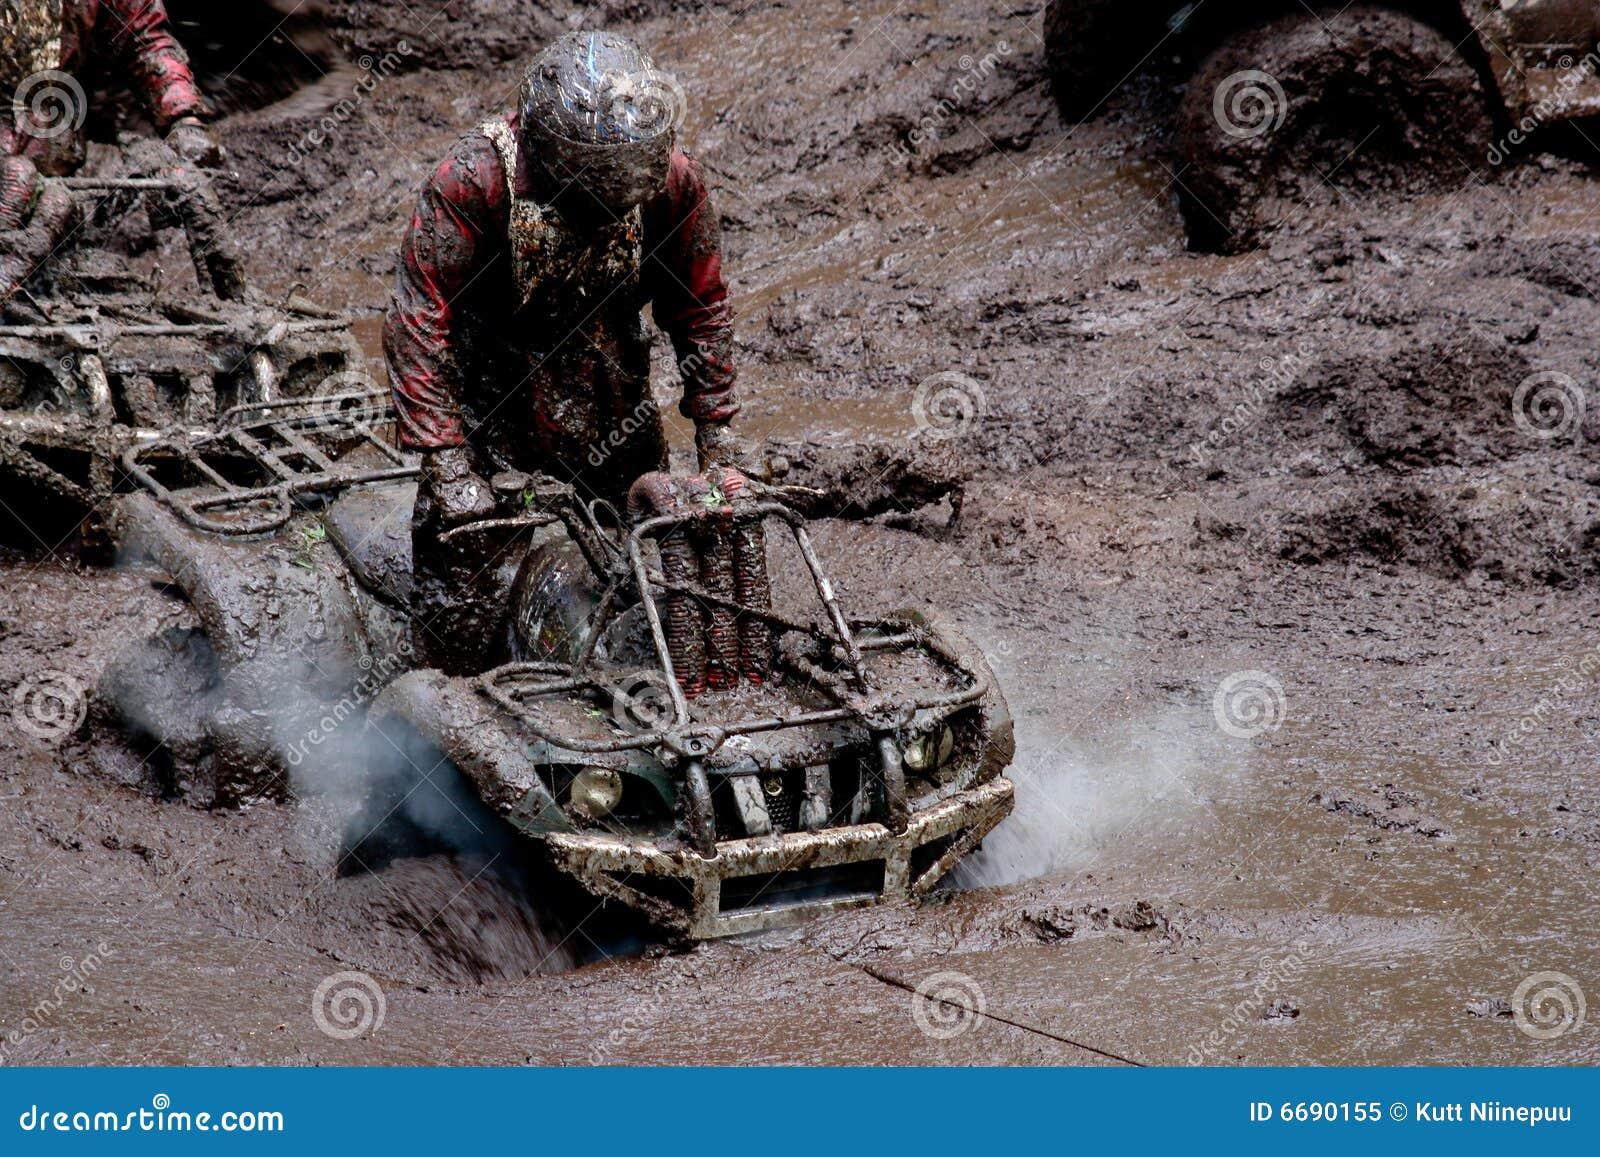 All-terrain vehicles in mud